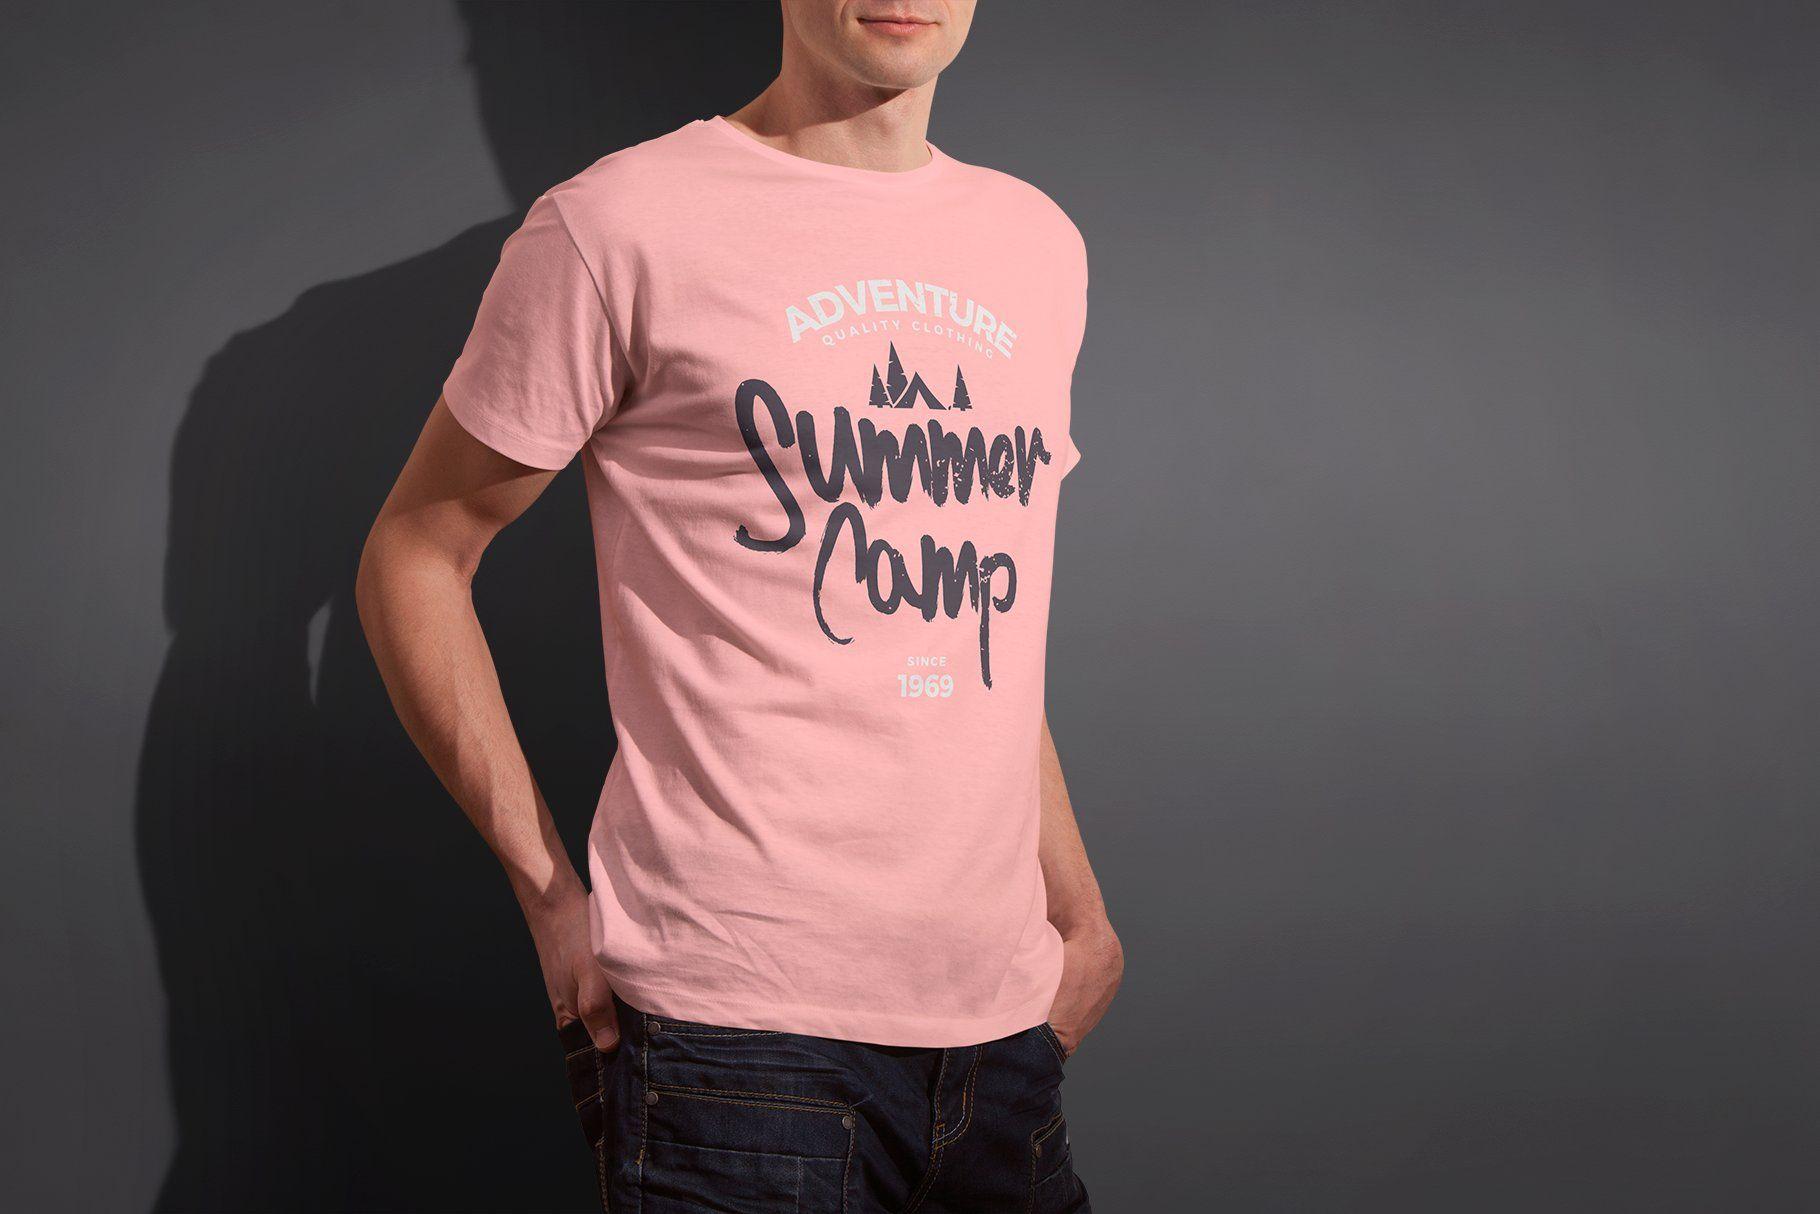 Download Mens Crew Neck T Shirt Mock Up T Shirt Printing Company Mens Crew Neck Blank T Shirts